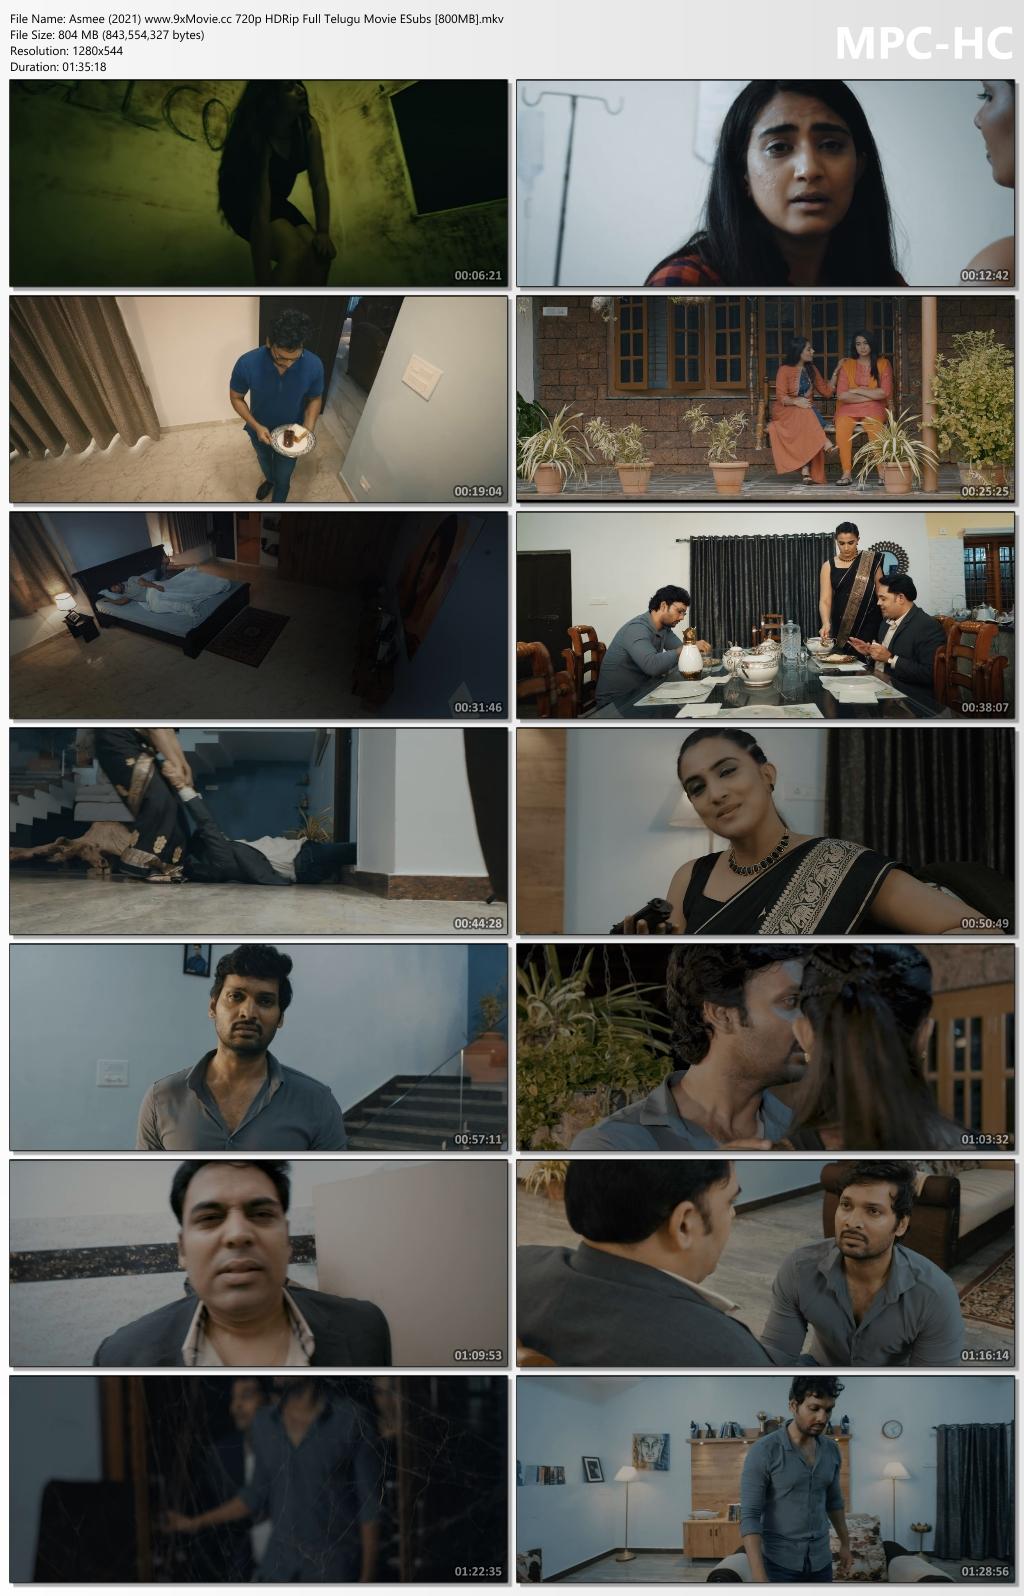 Asmee-2021-www-9x-Movie-cc-720p-HDRip-Full-Telugu-Movie-ESubs-800-MB-mkv